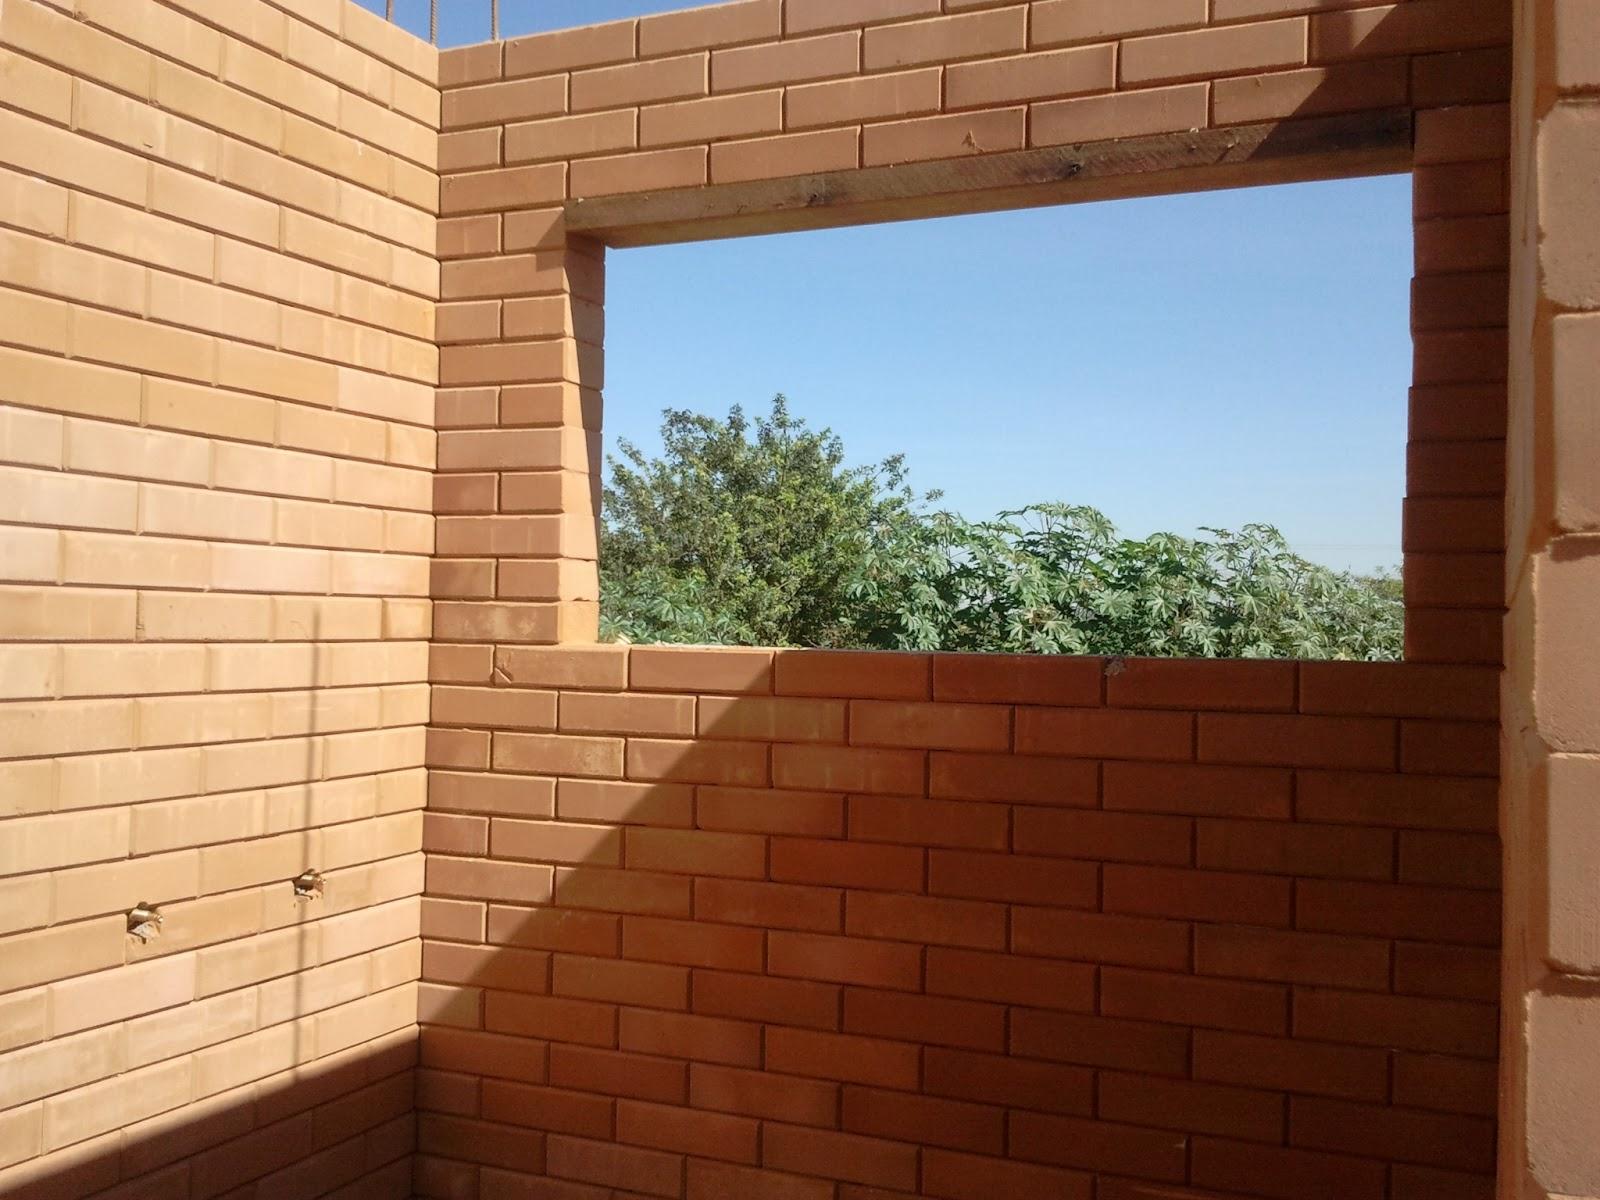 Construindo e Ampliando com Tijolo Solo cimento / Ecológico  #401809 1600 1200